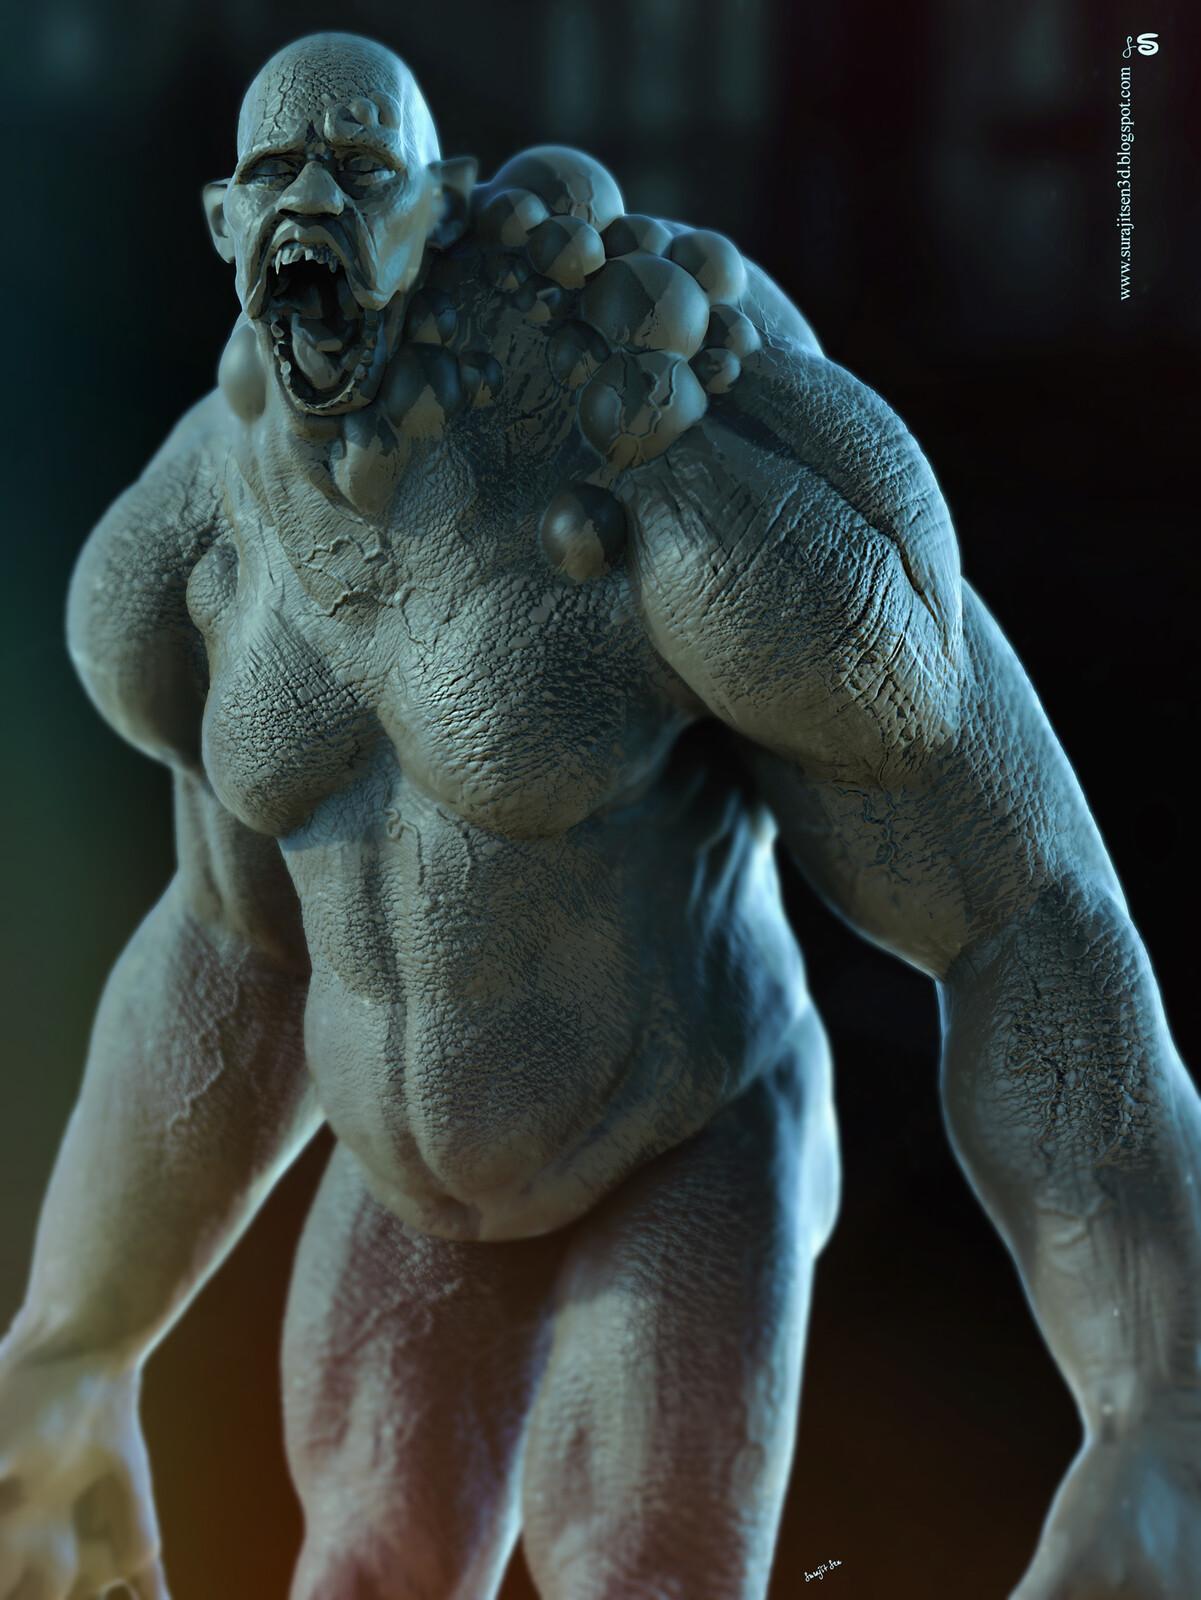 Monster2.2 Digital Sculpture Quick blocking Free time study work Background music- #hanszimmermusic